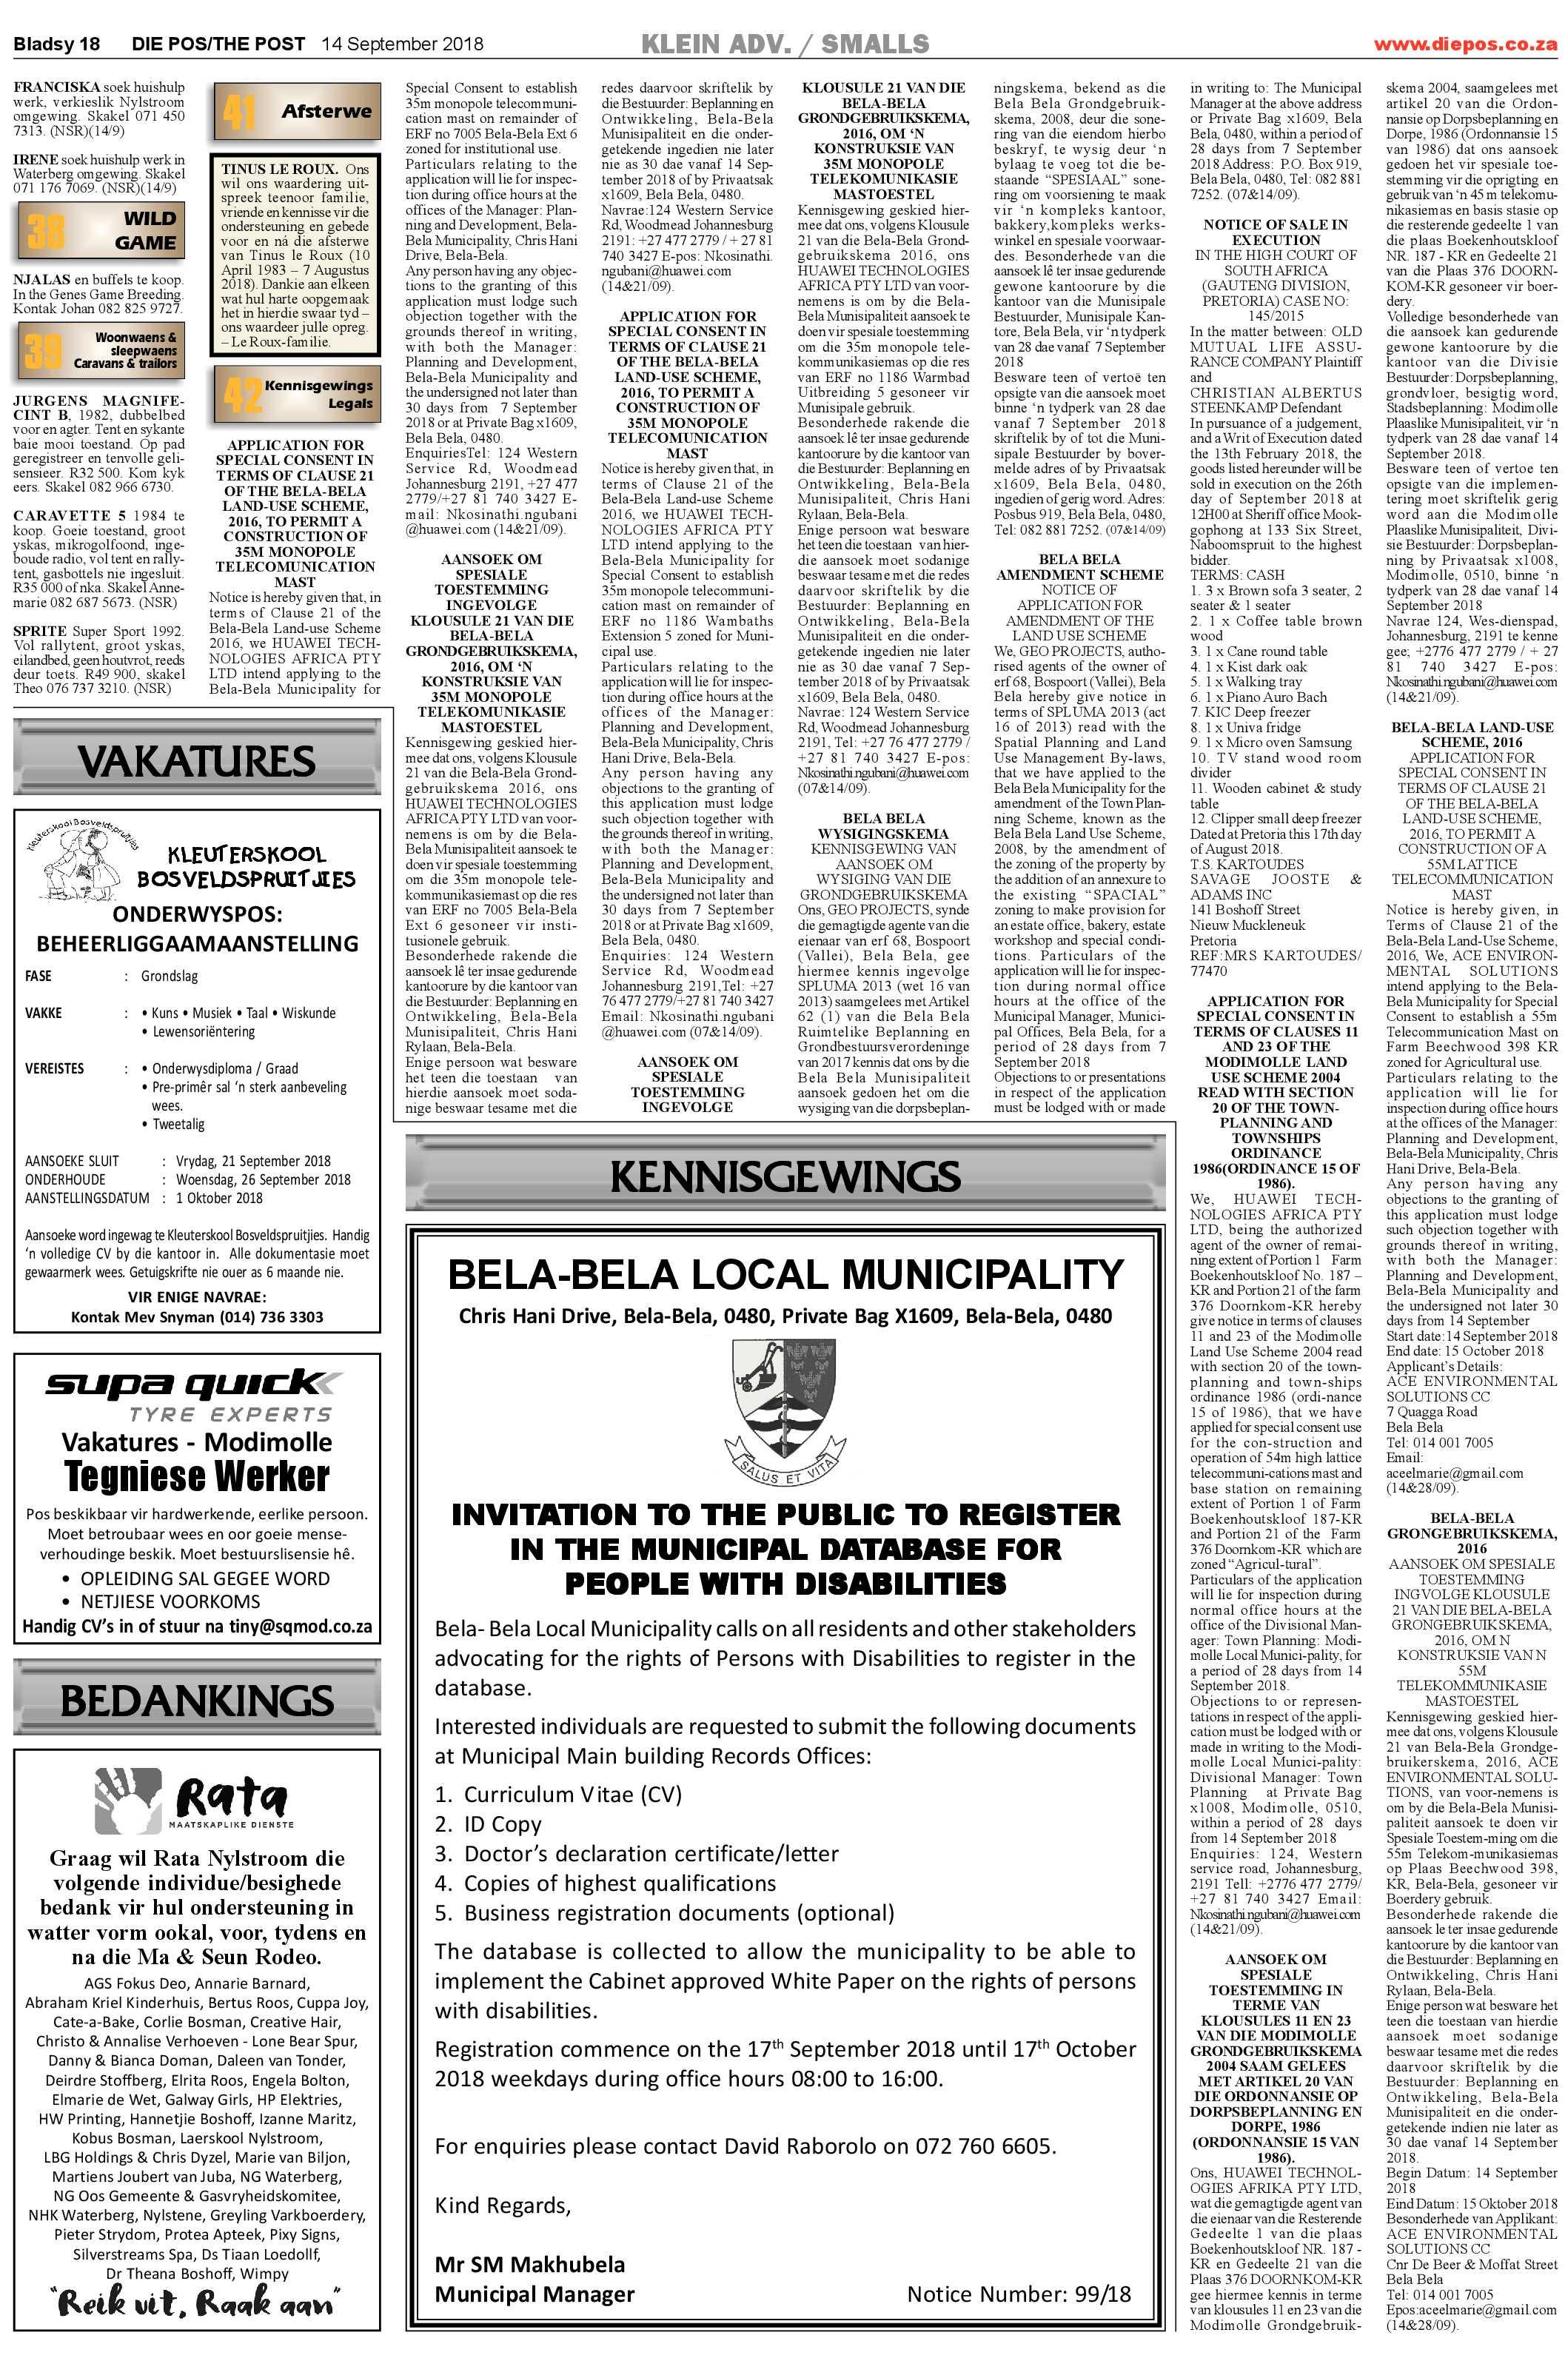 smalls-vacancies-14-september-2018-epapers-page-3